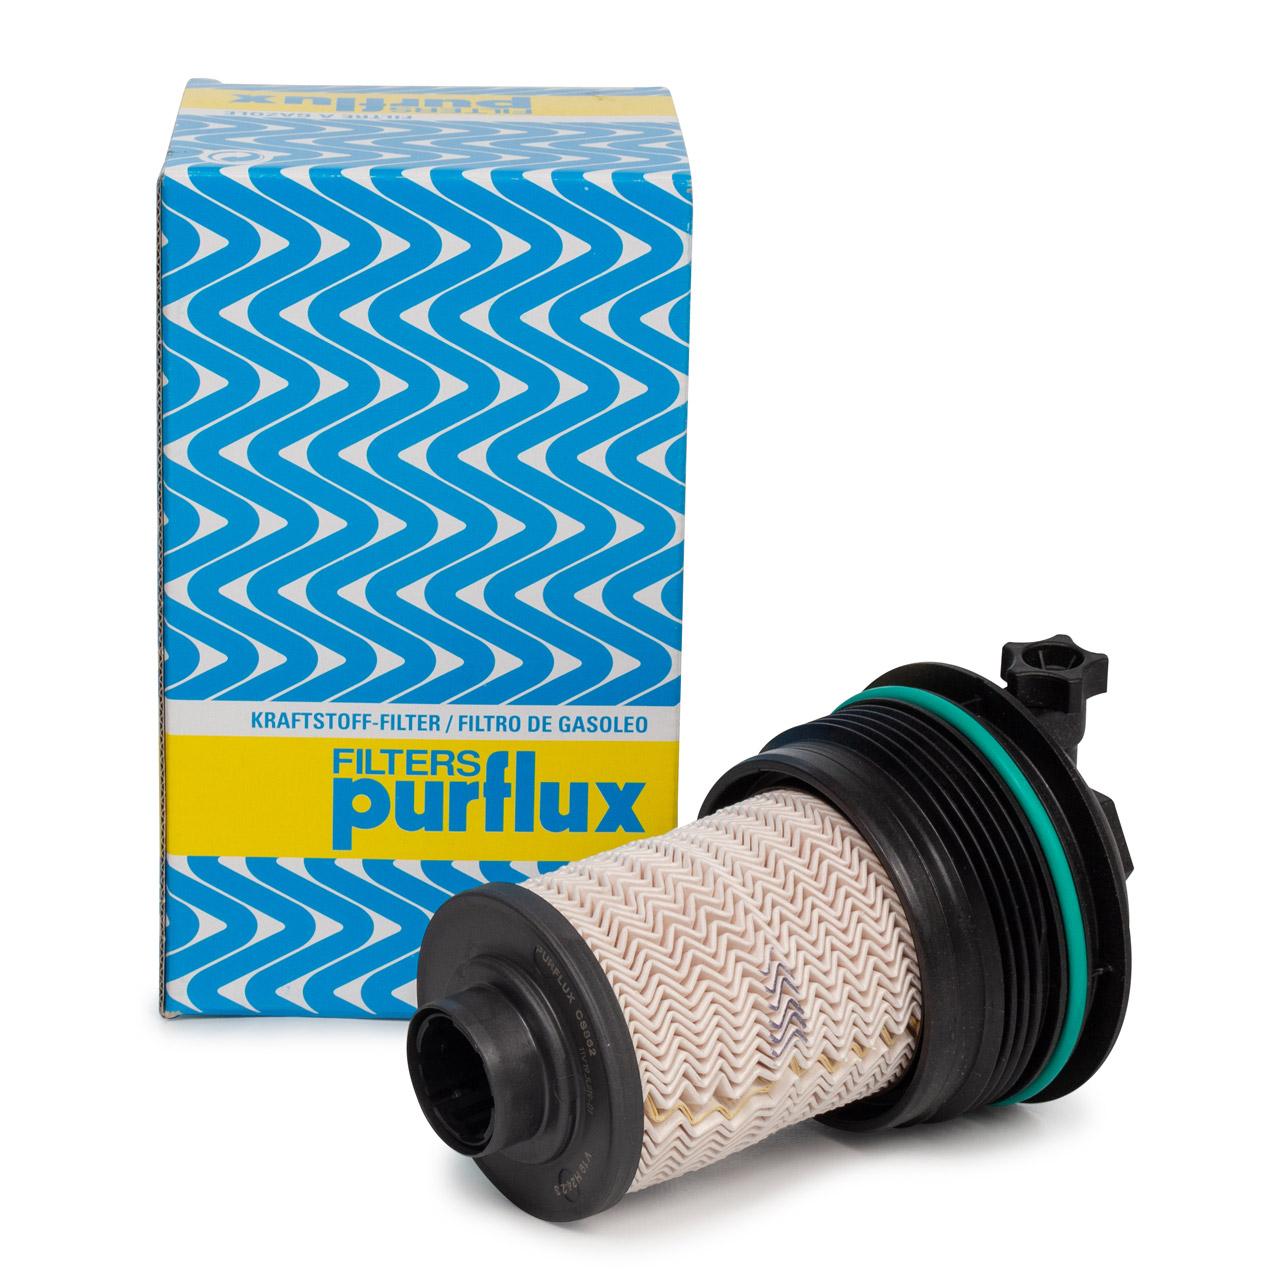 PURFLUX Kraftstofffilter Dieselfilter FORD Transit / Tourneo Custom 2.0 TDCI 2005485